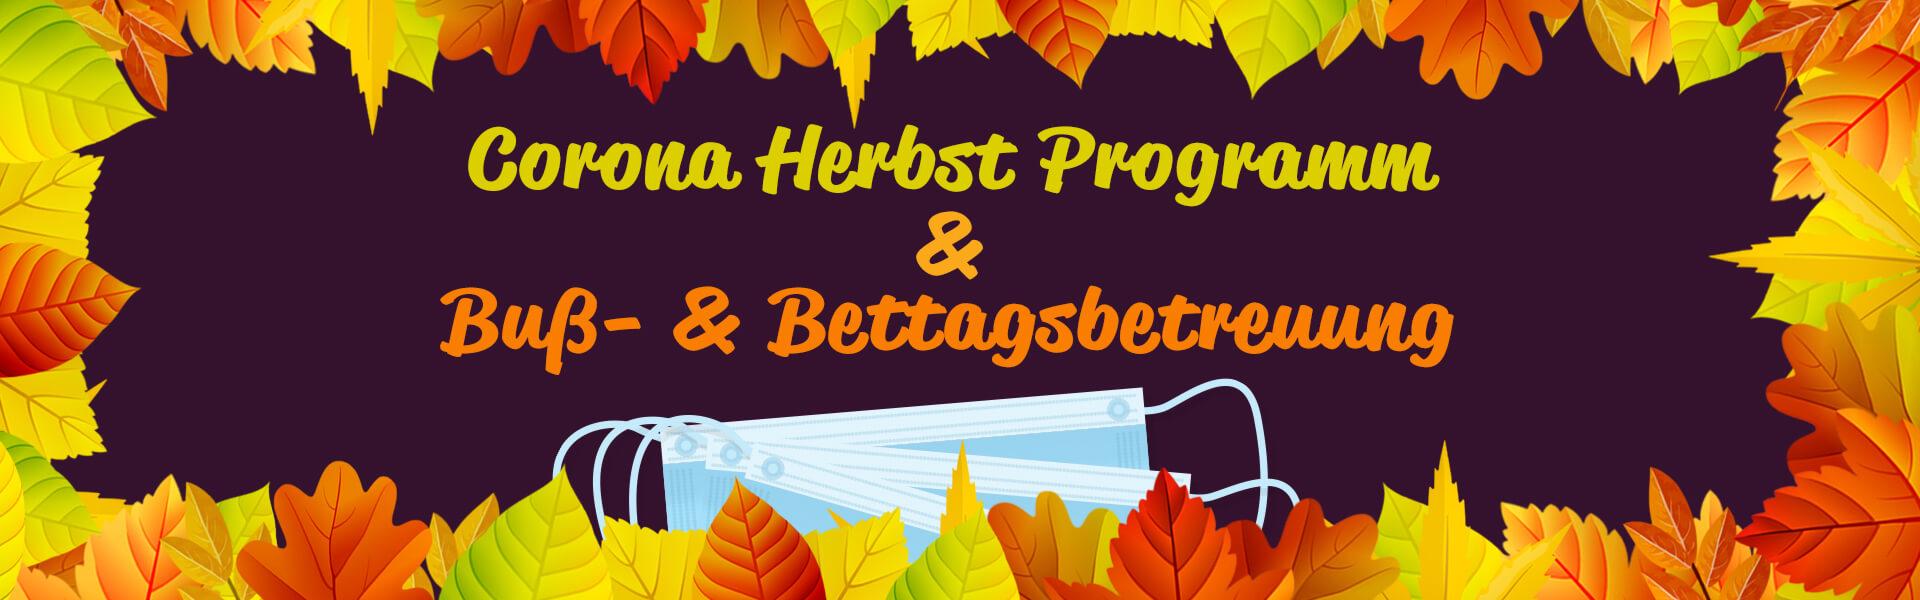 Bannerbild Corona Herbst Programm Stadtjugendpflege Moosburg